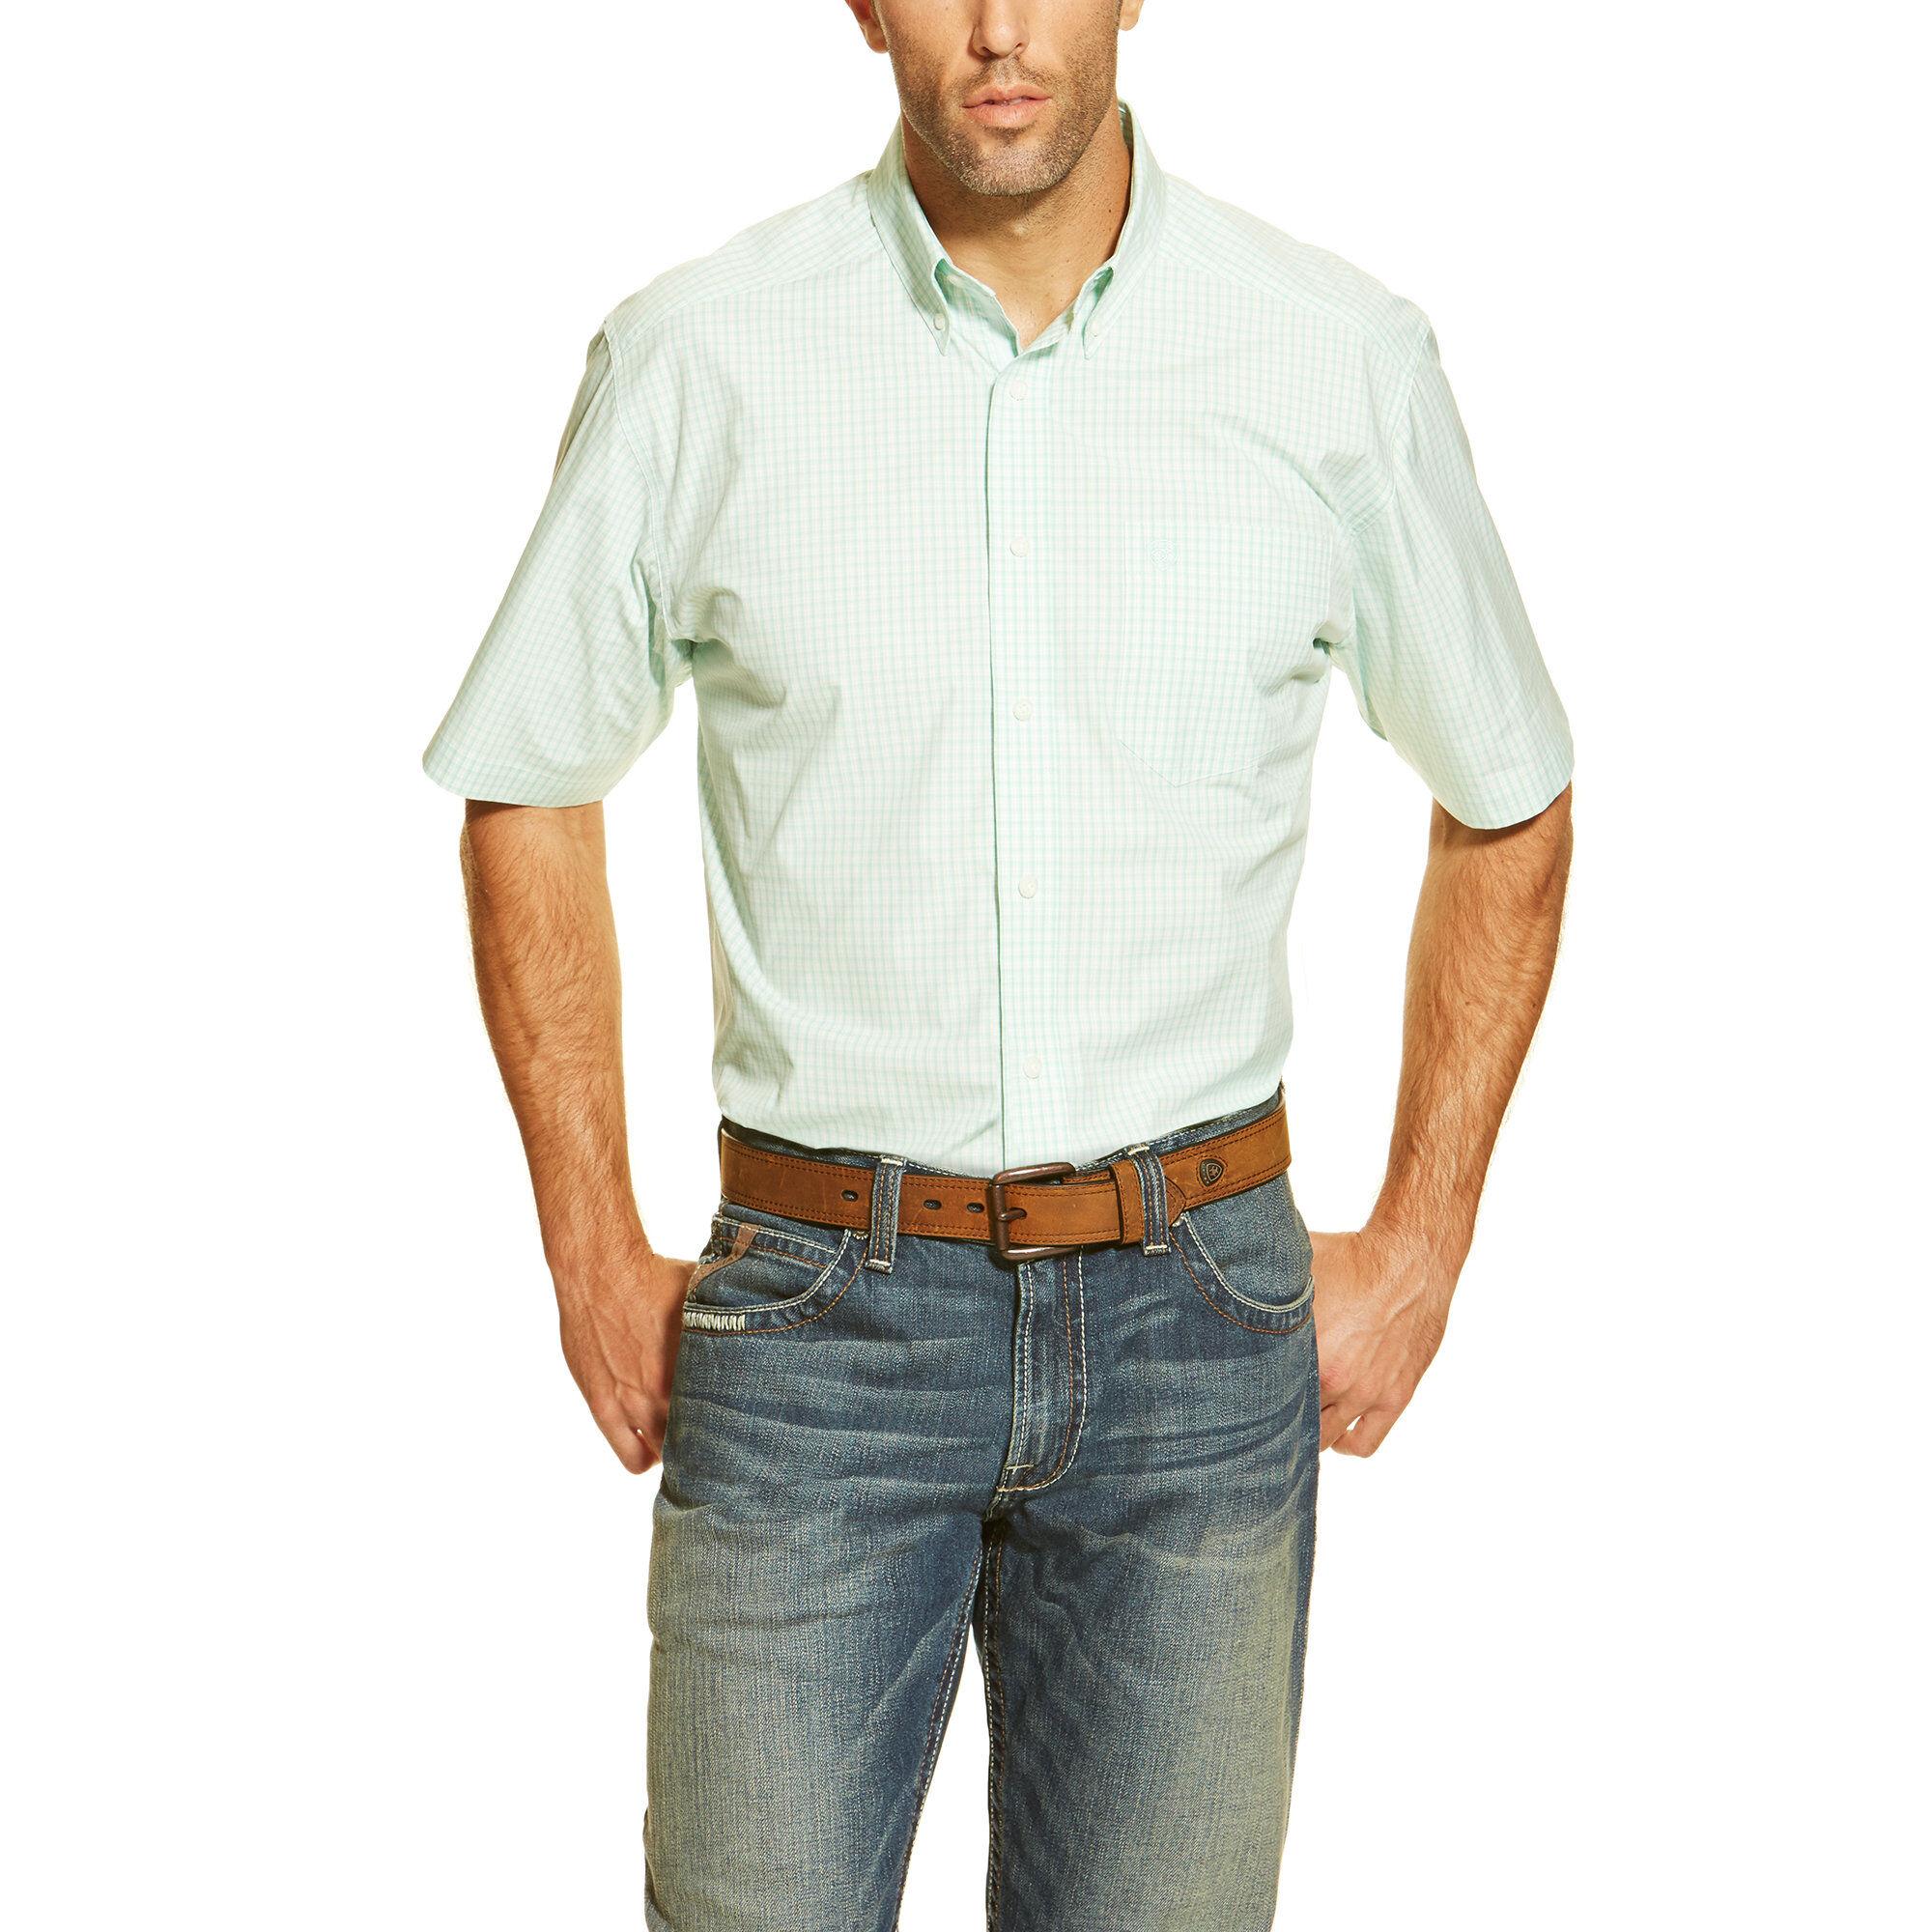 Hackman SS Perf Shirt